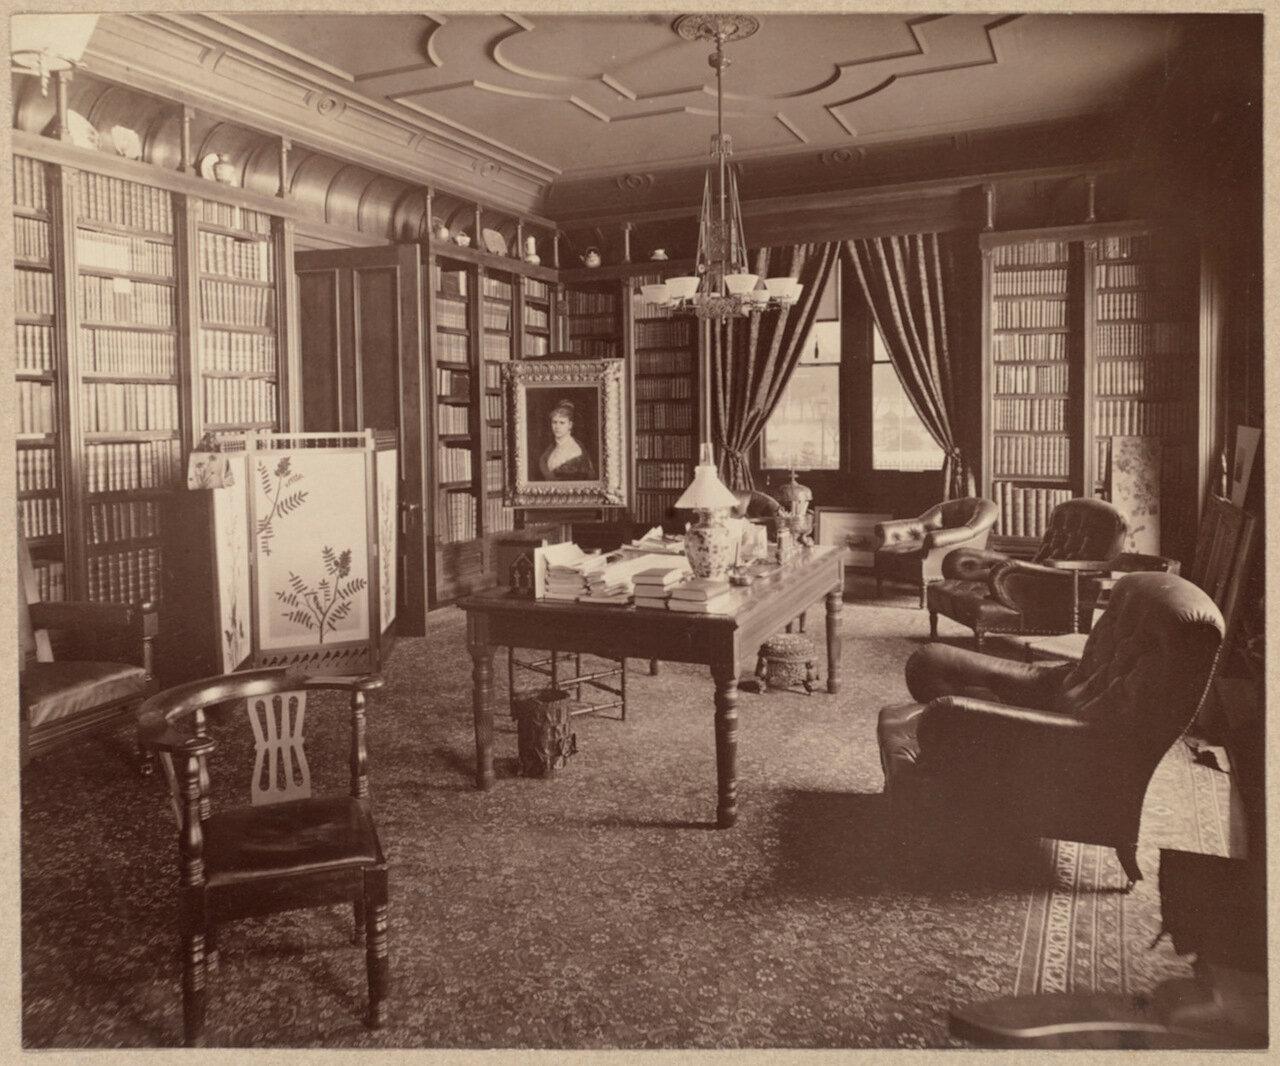 Конец XIX века. Библиотека на Бекон-стрит зимой